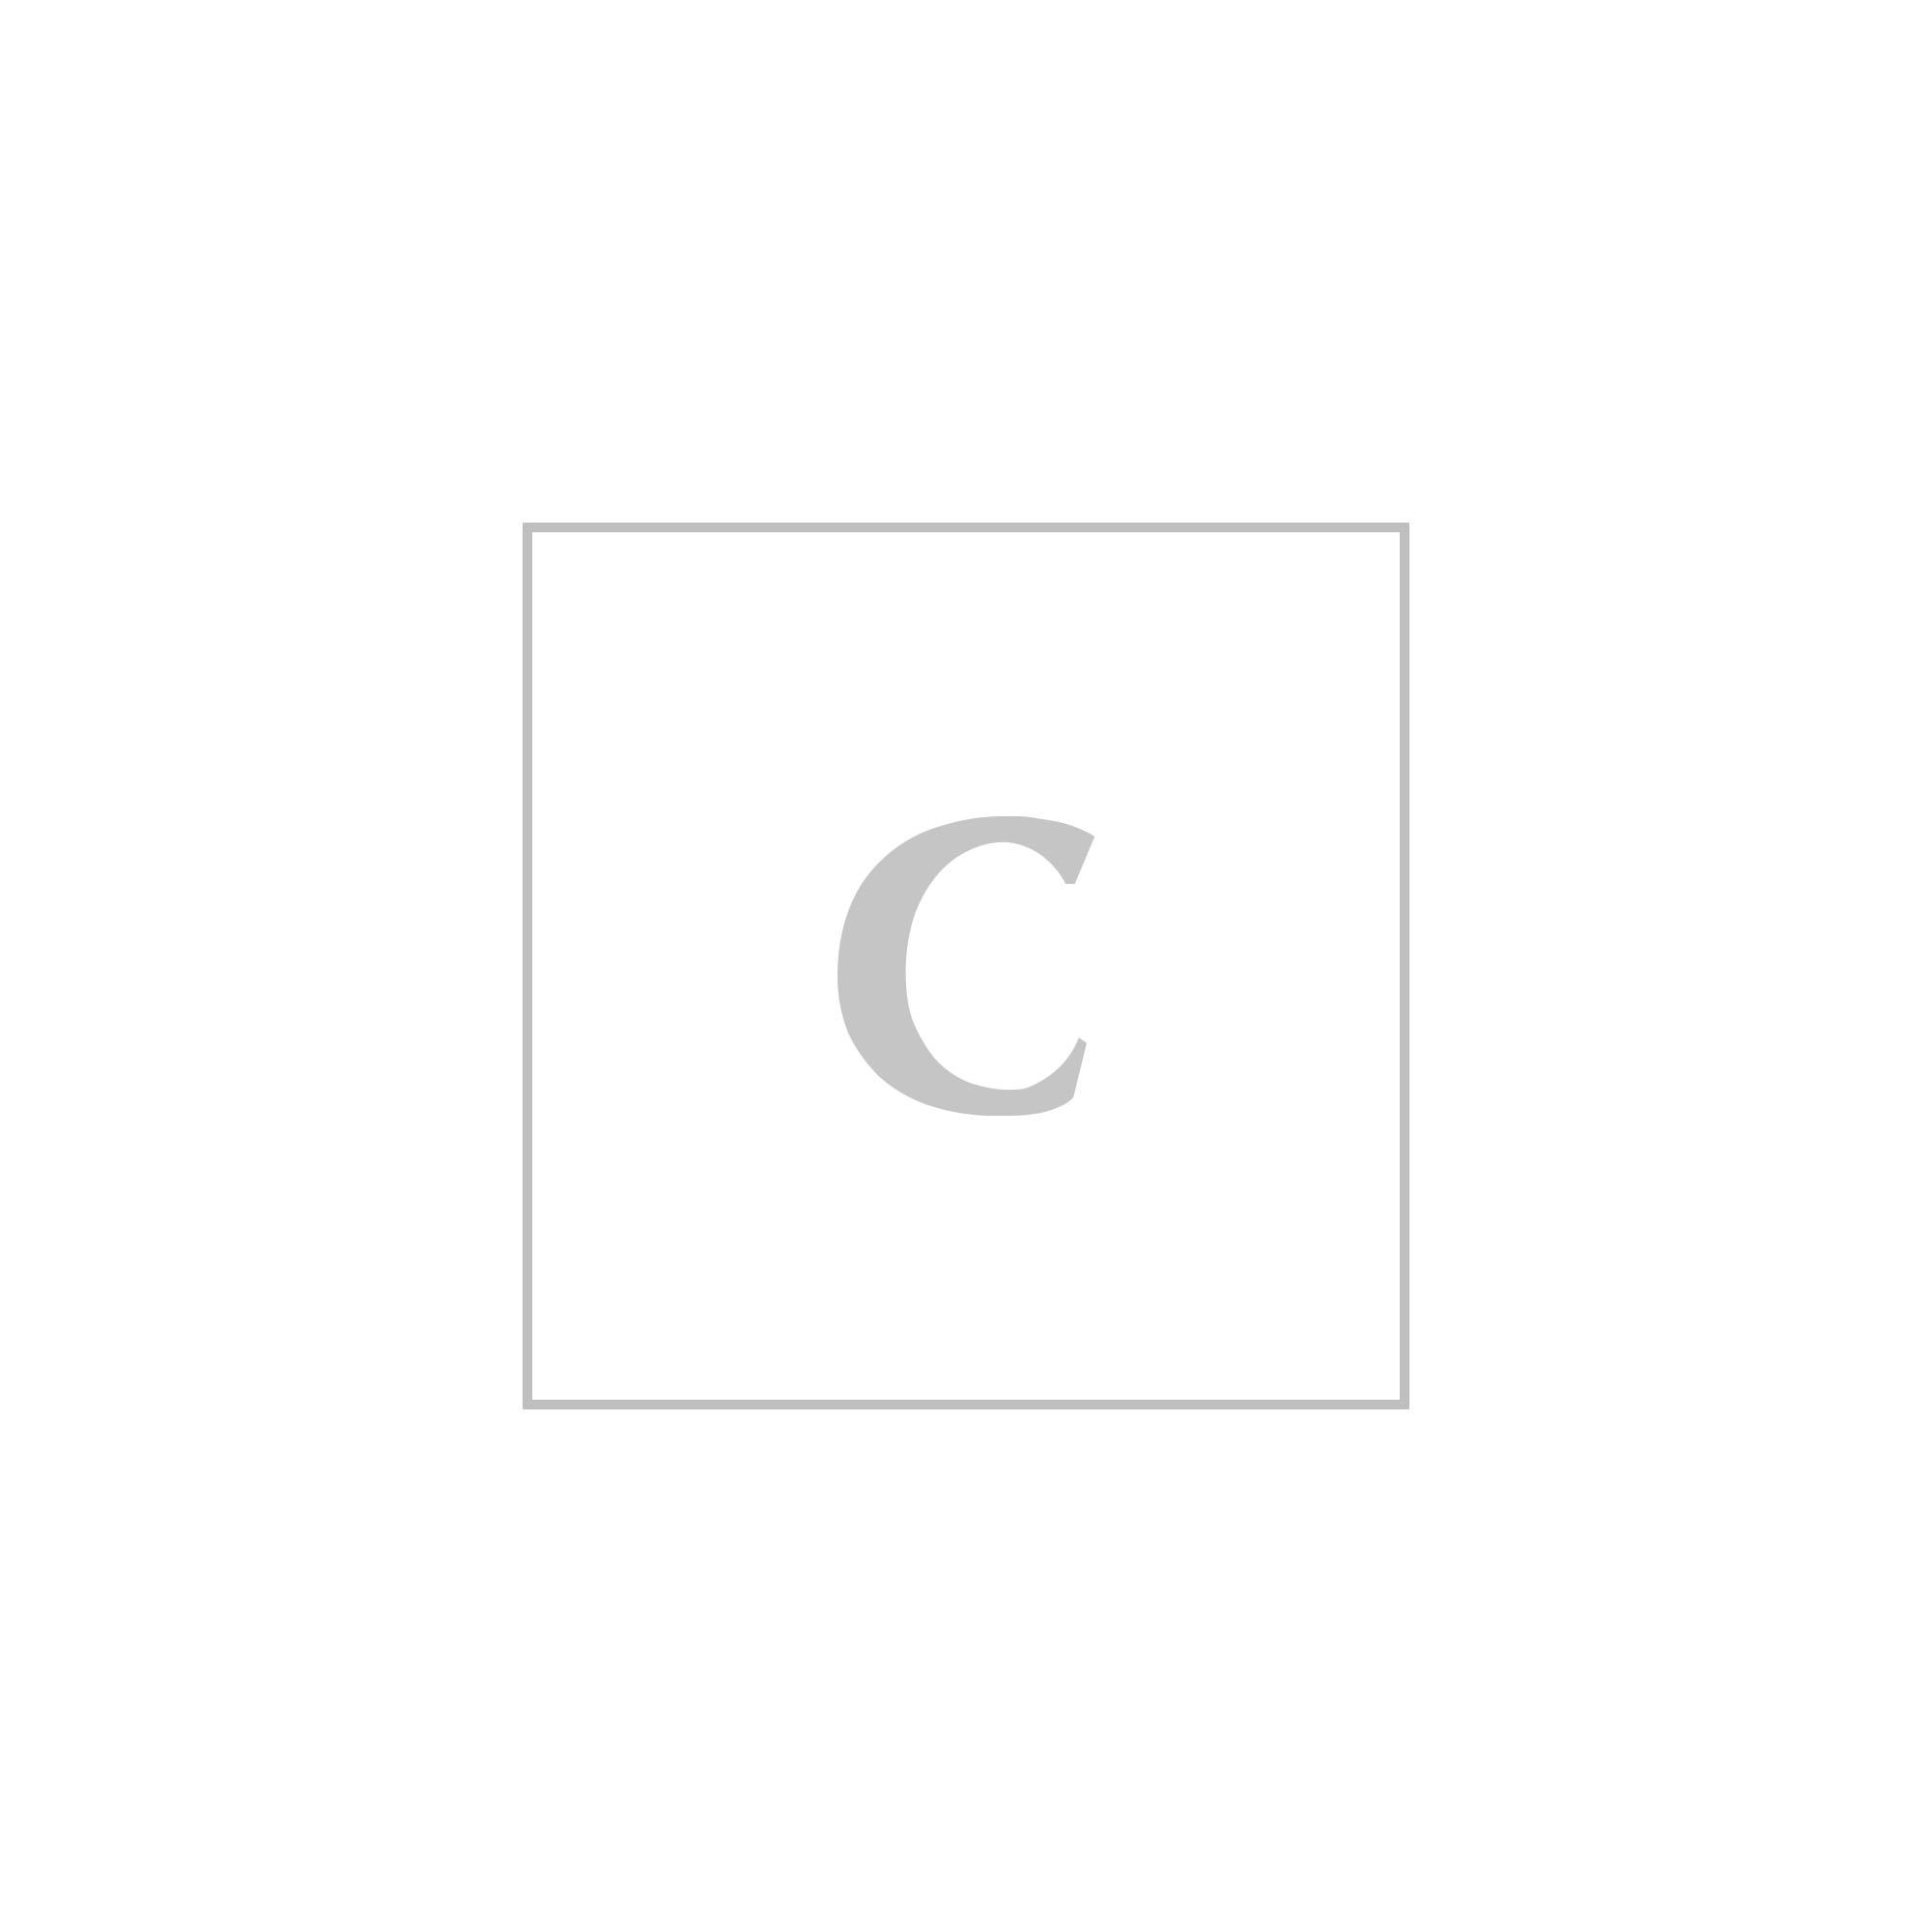 Charlotte olympia stivali corine